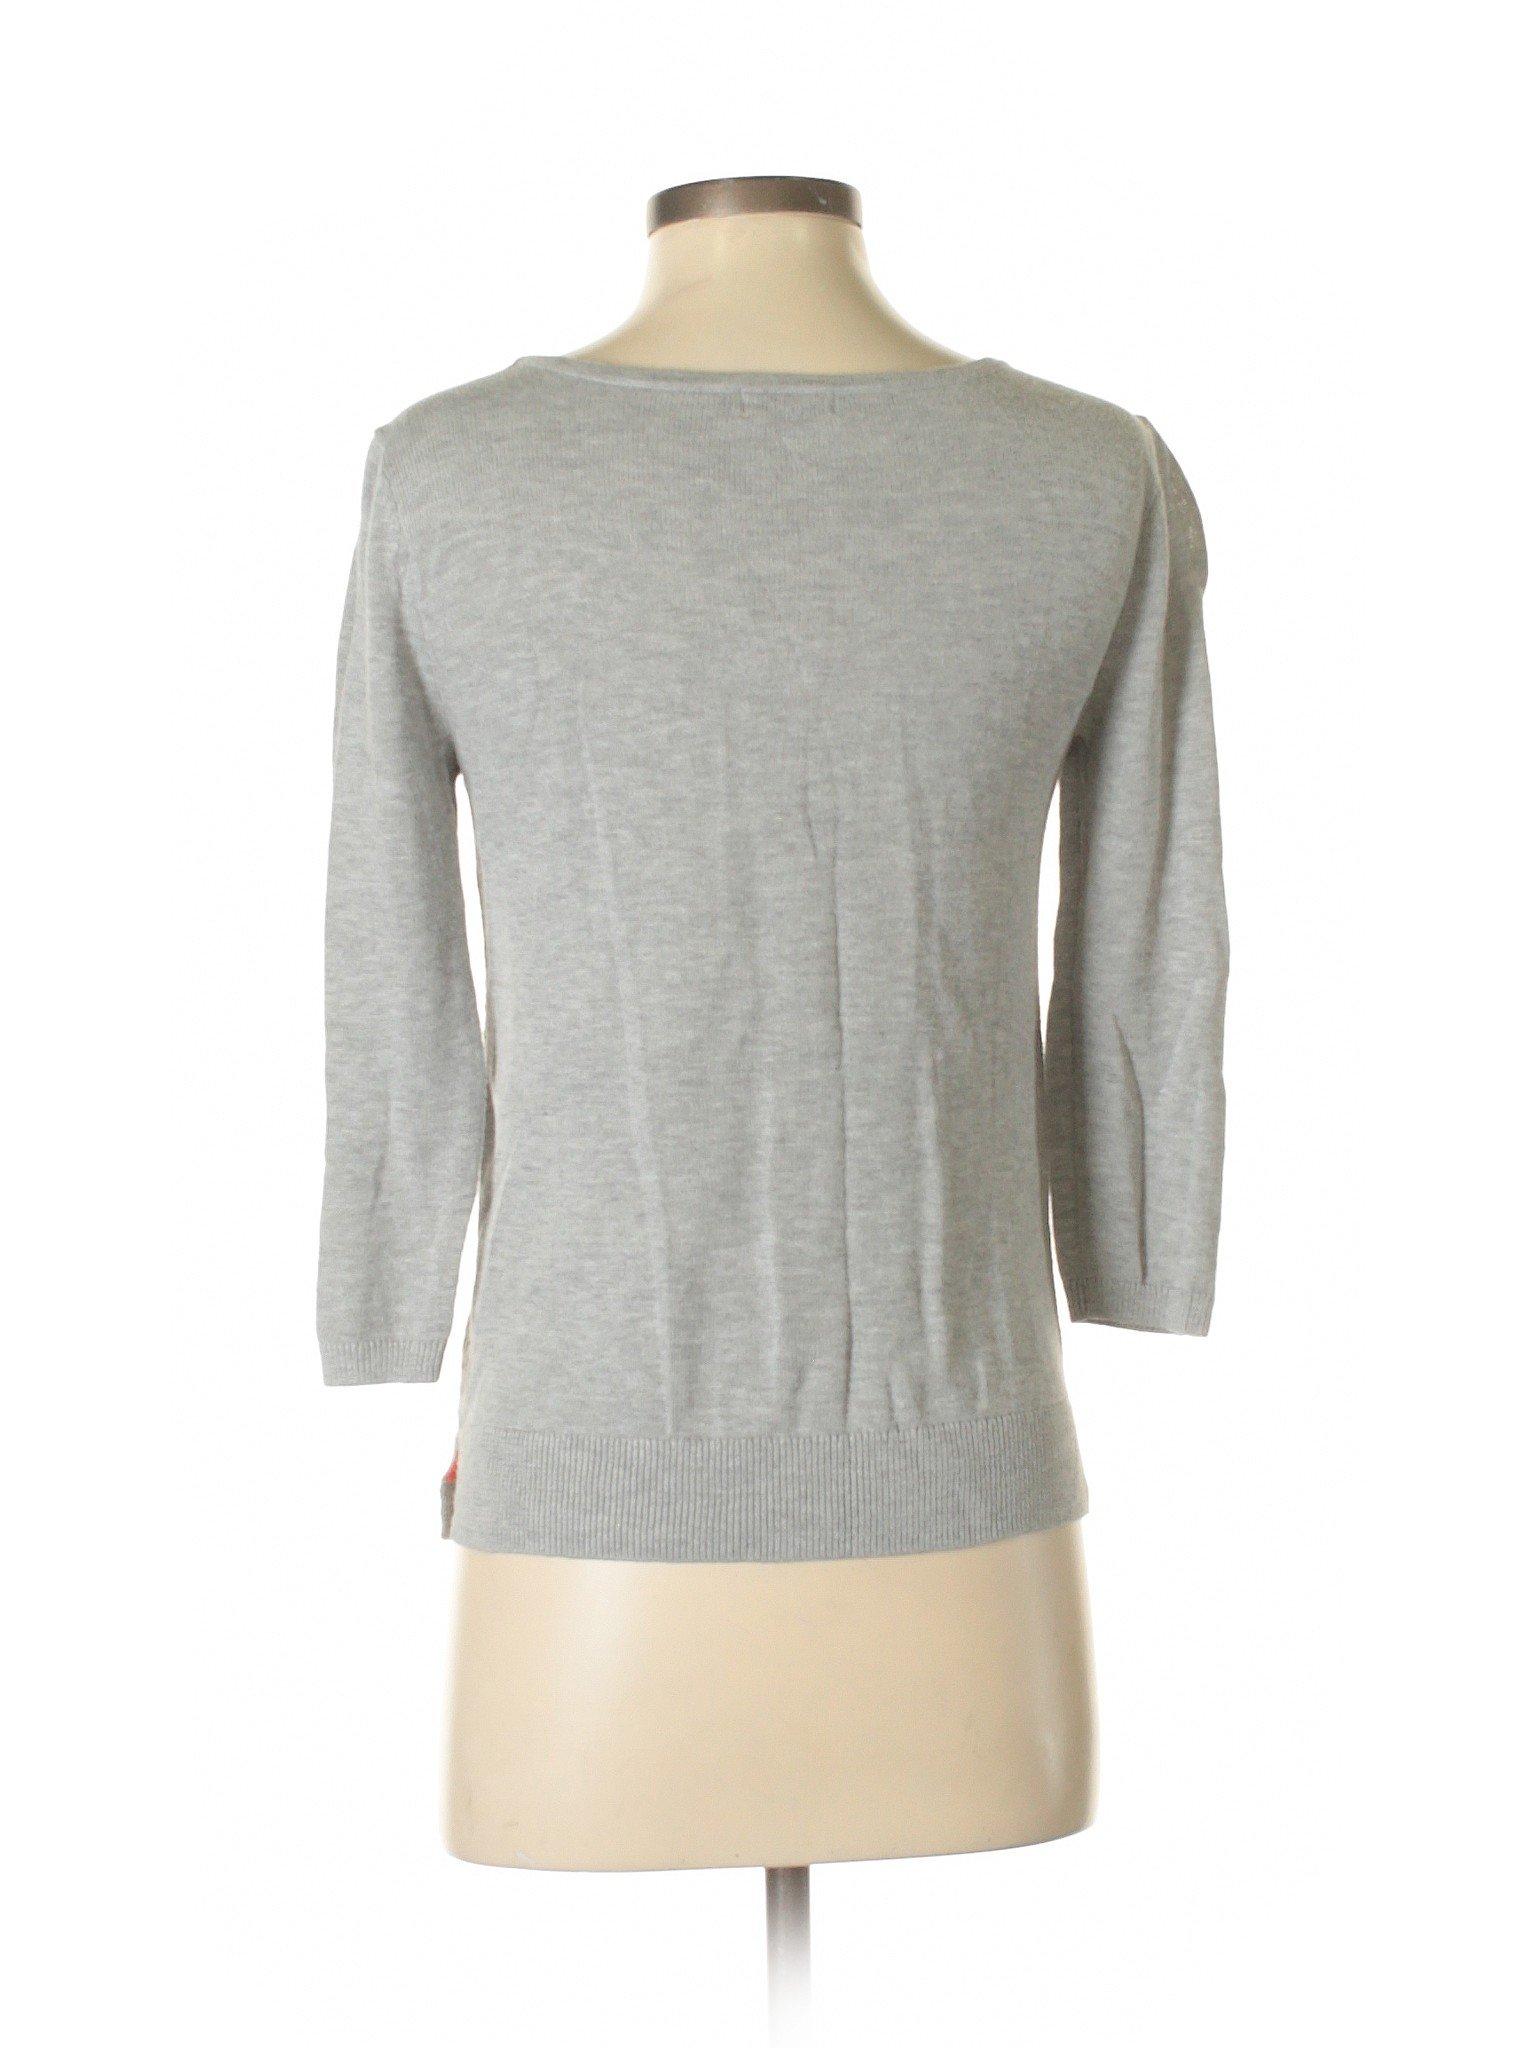 Hinge Pullover Boutique Boutique Hinge Sweater Sweater Pullover Hinge Boutique Pullover Sweater Hinge Sweater Boutique Pullover 5qpgxw0Bg